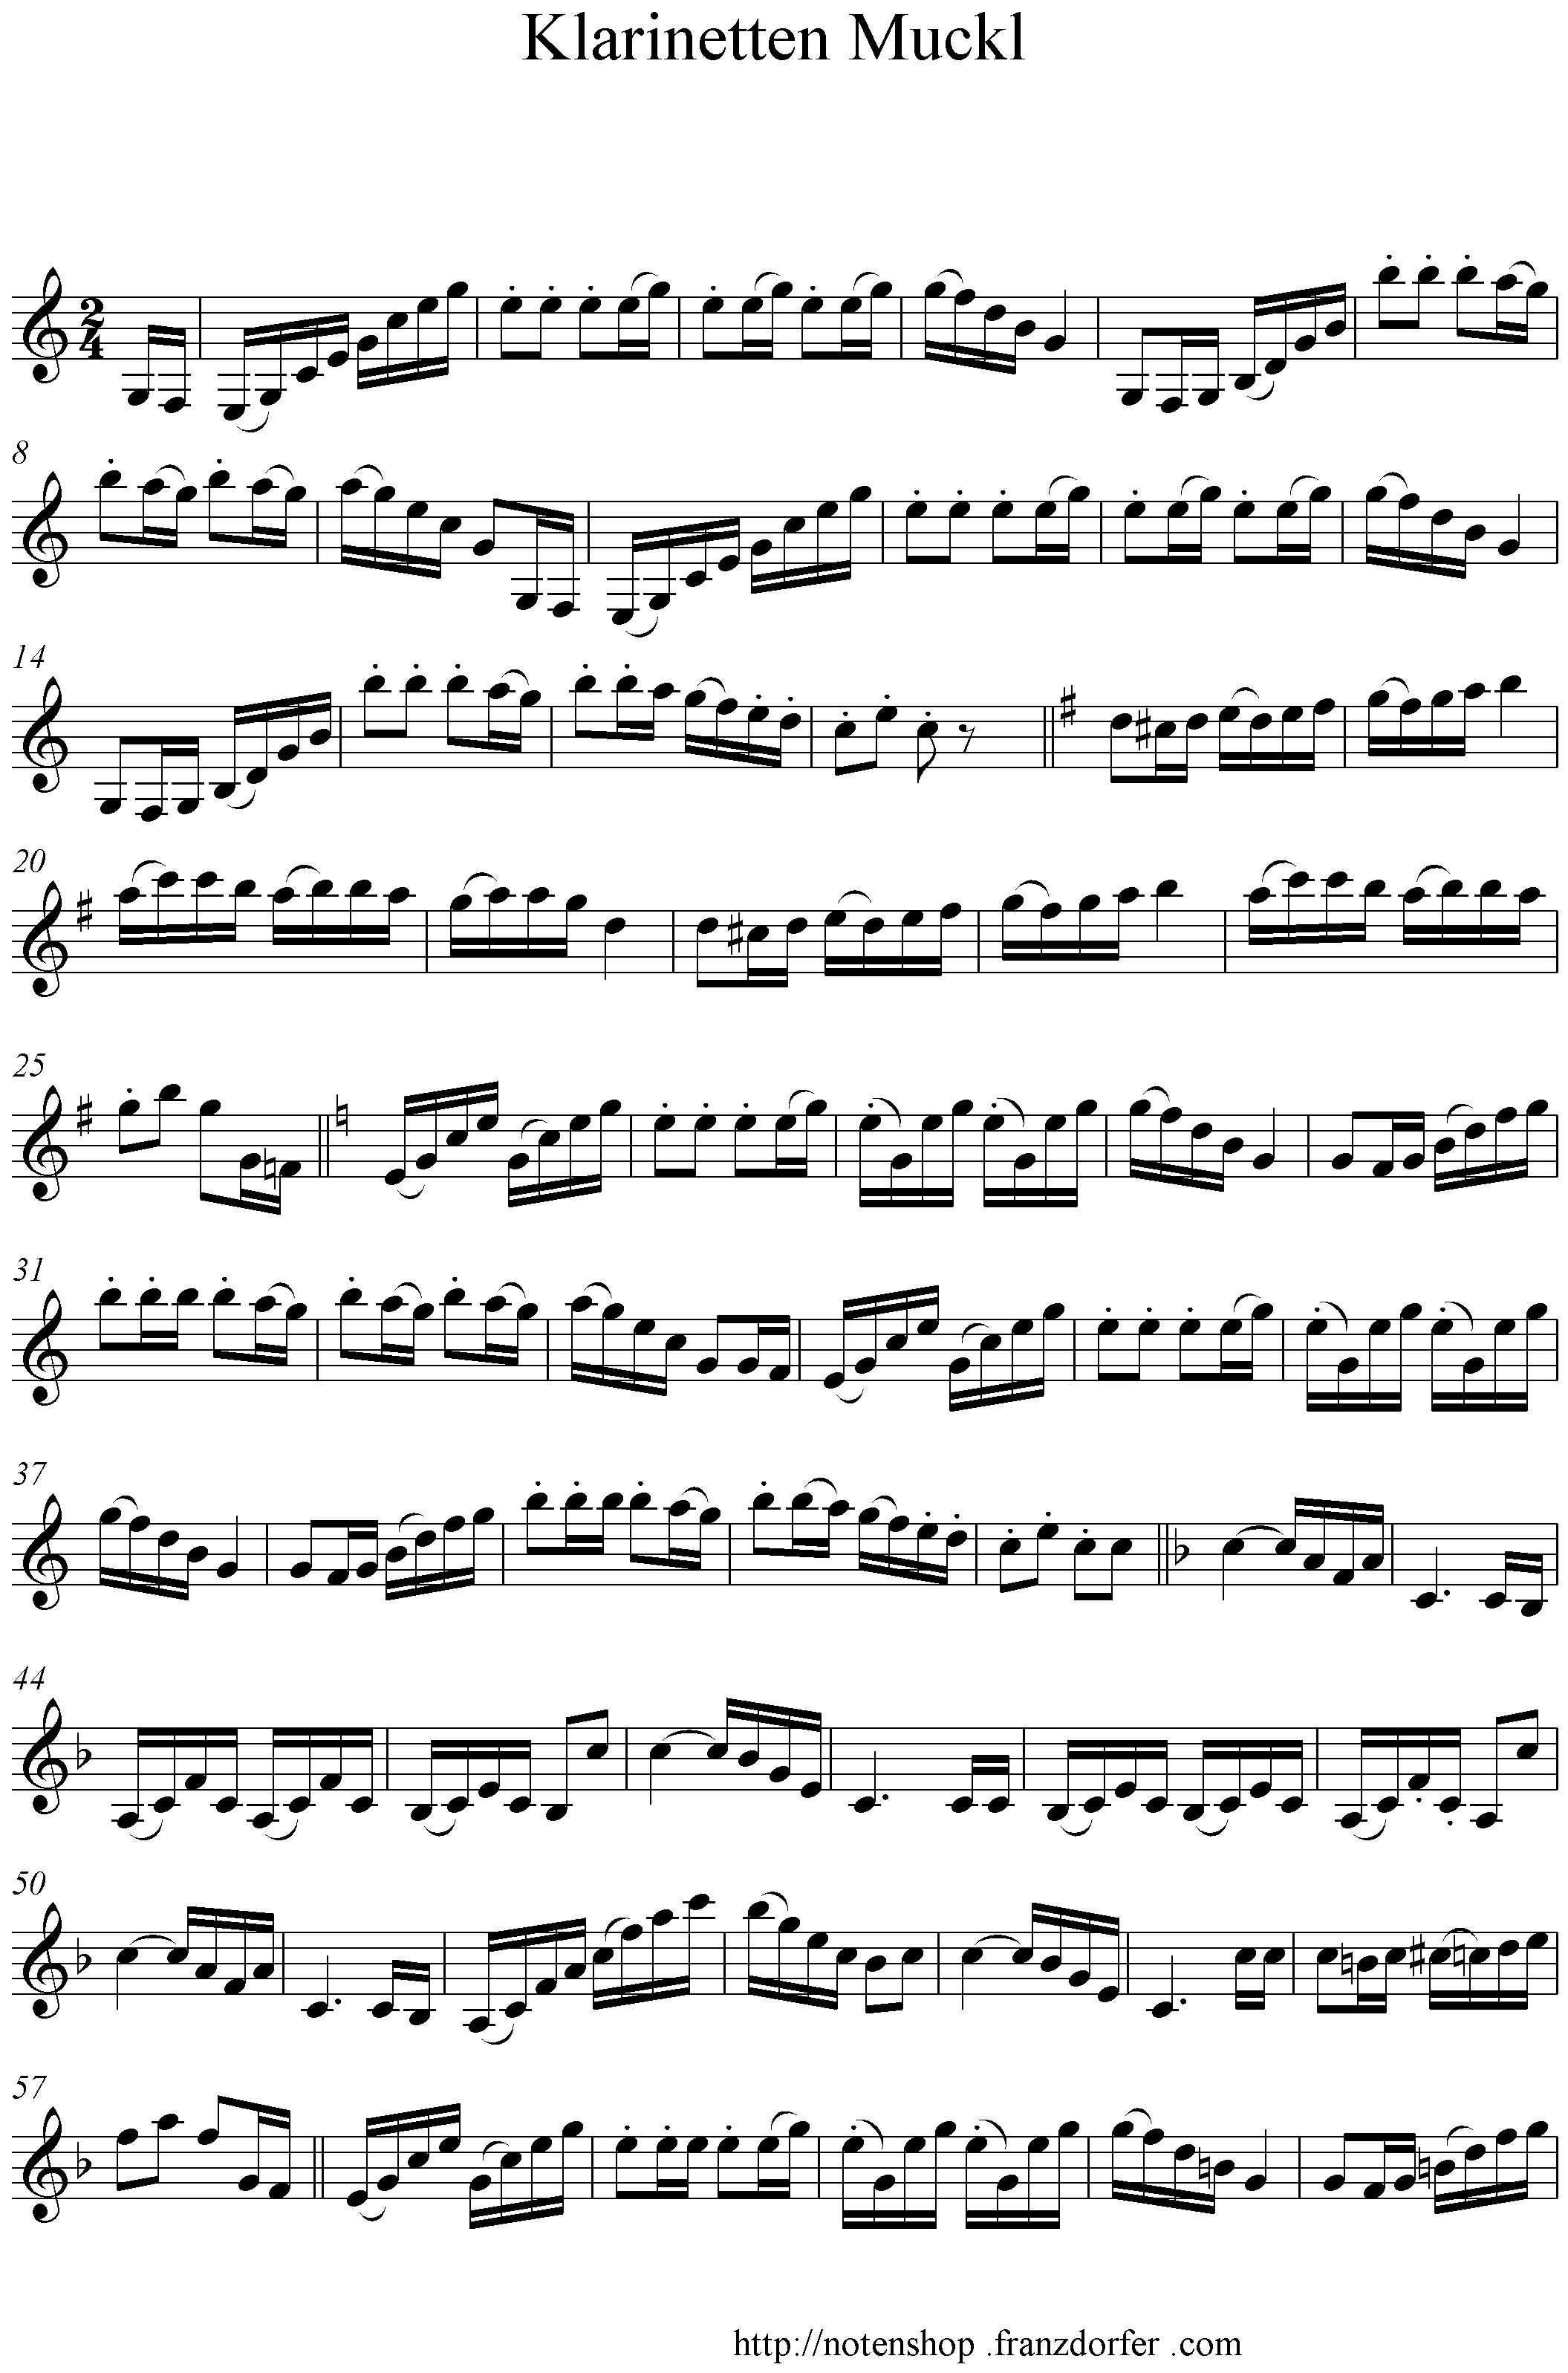 Klarinetten Muckl